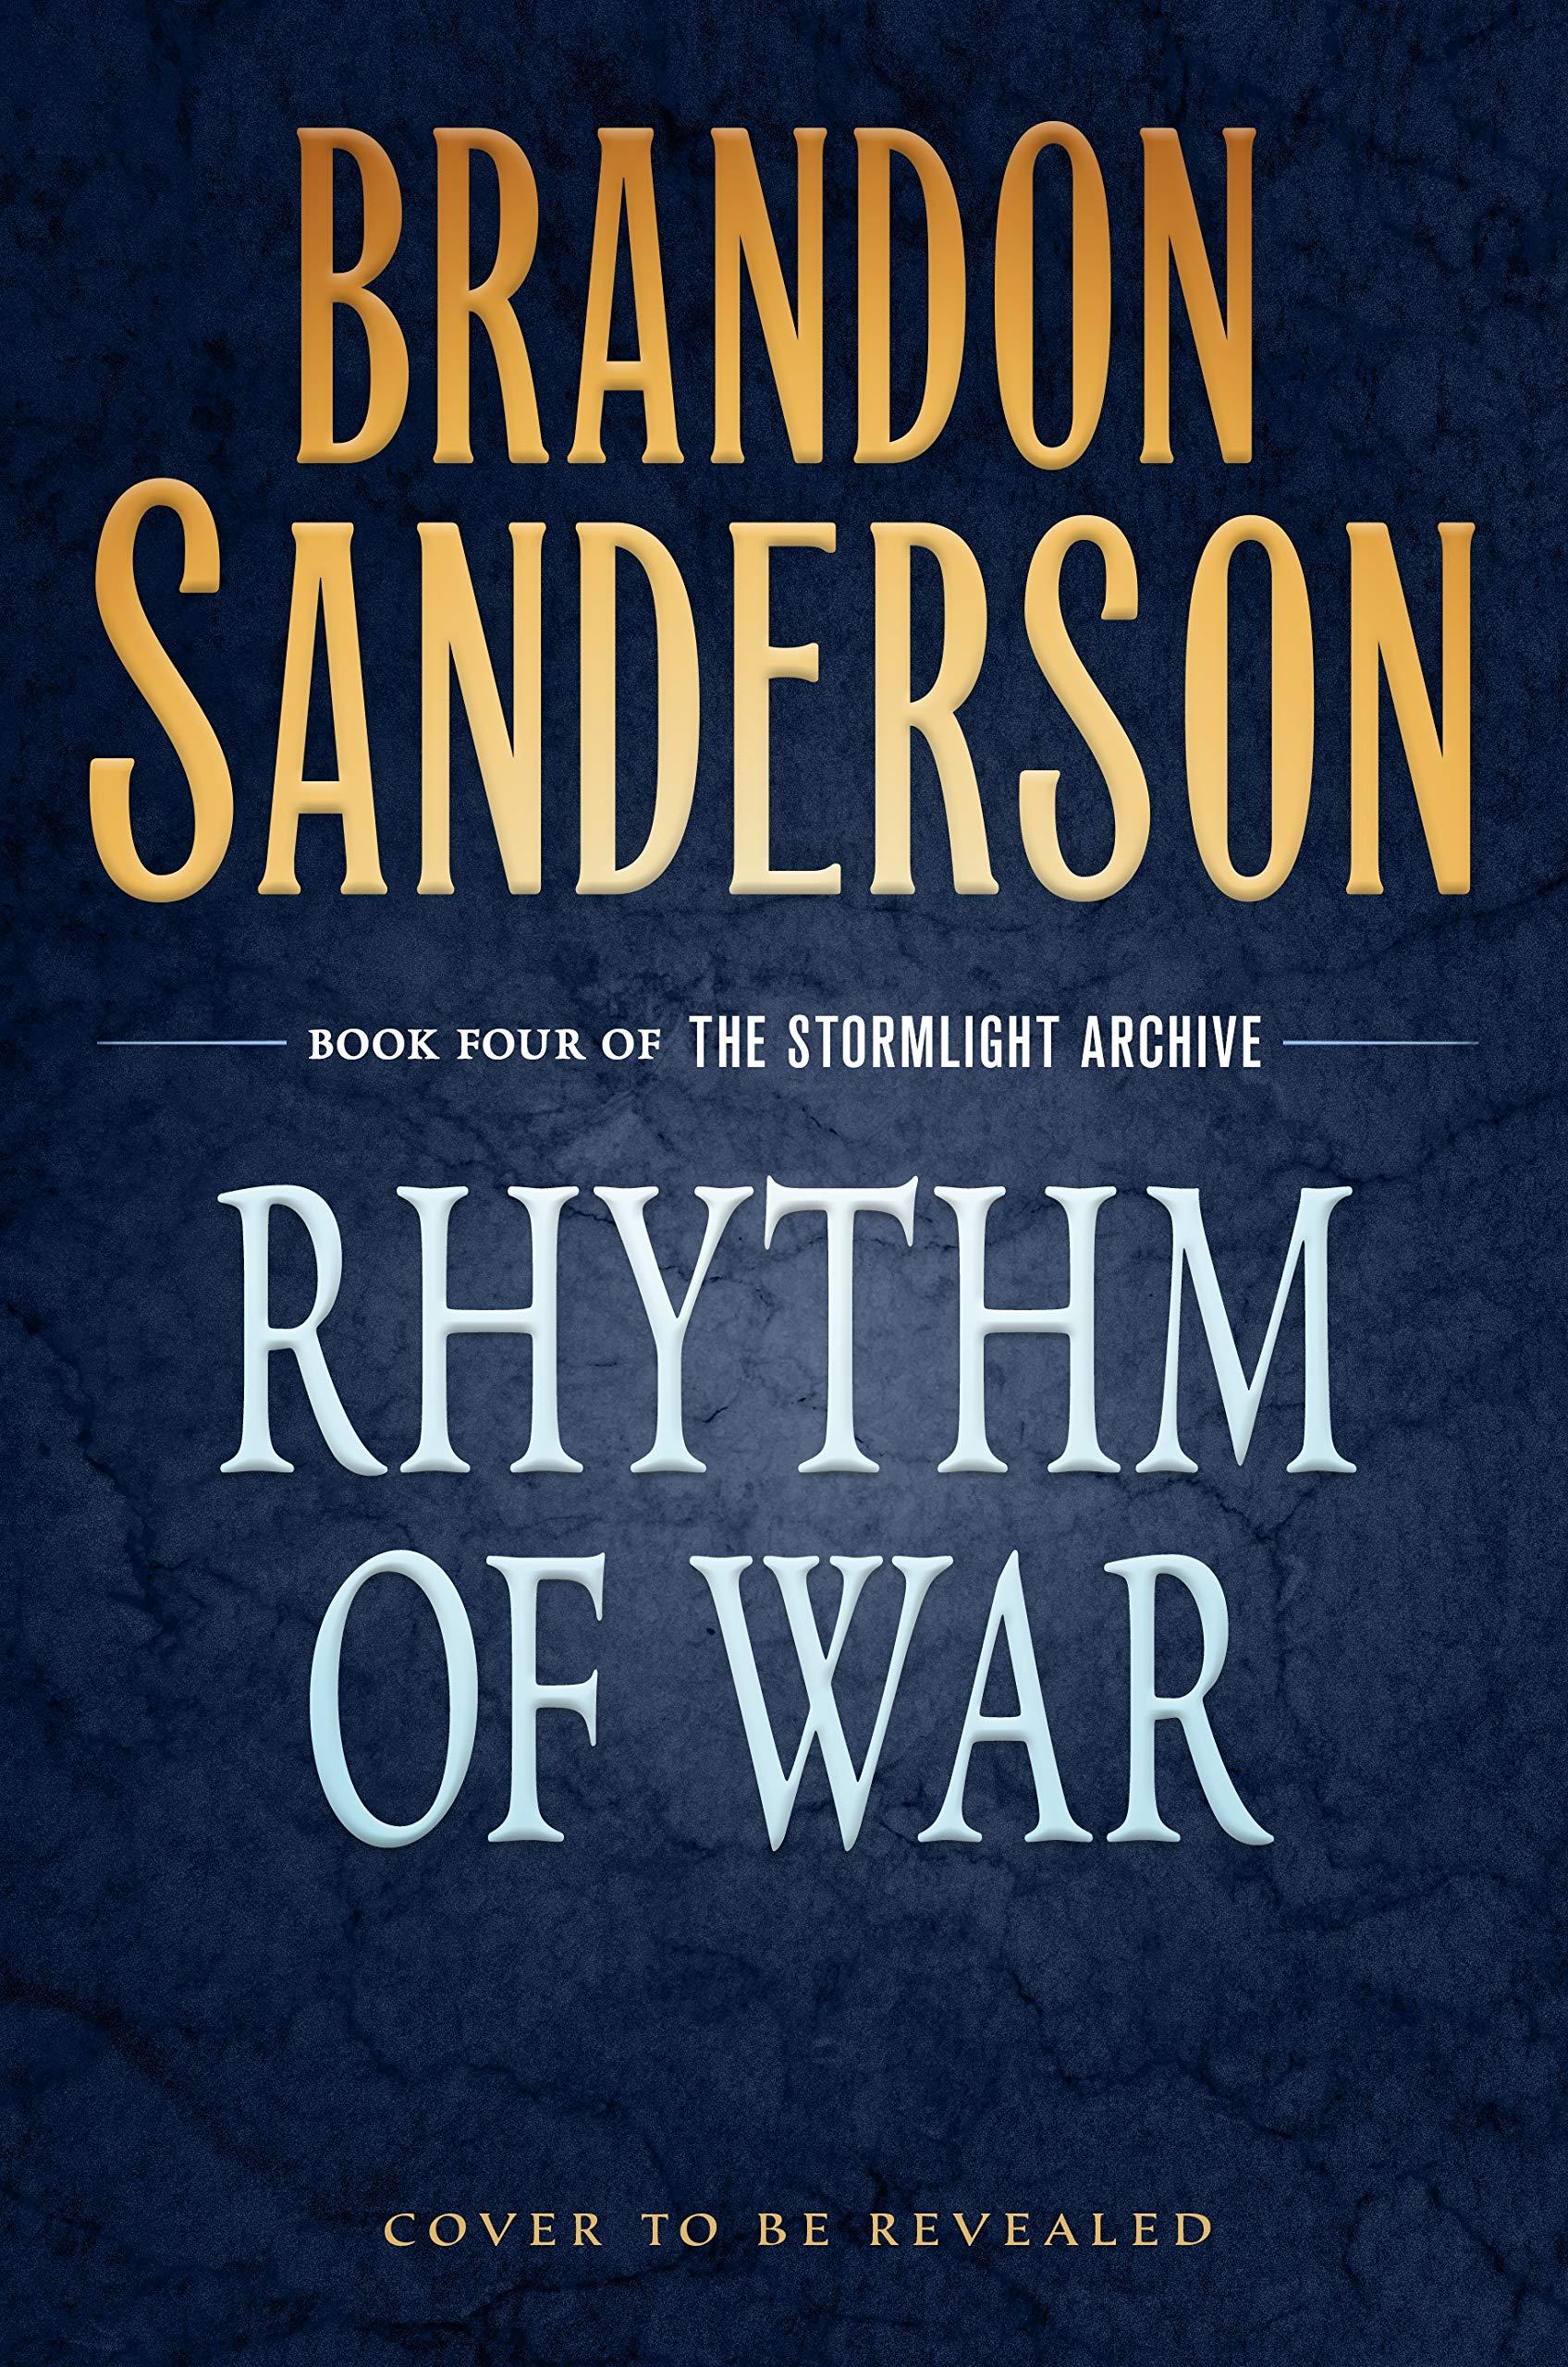 Rhythm of War (The Stormlight Archive, #4)